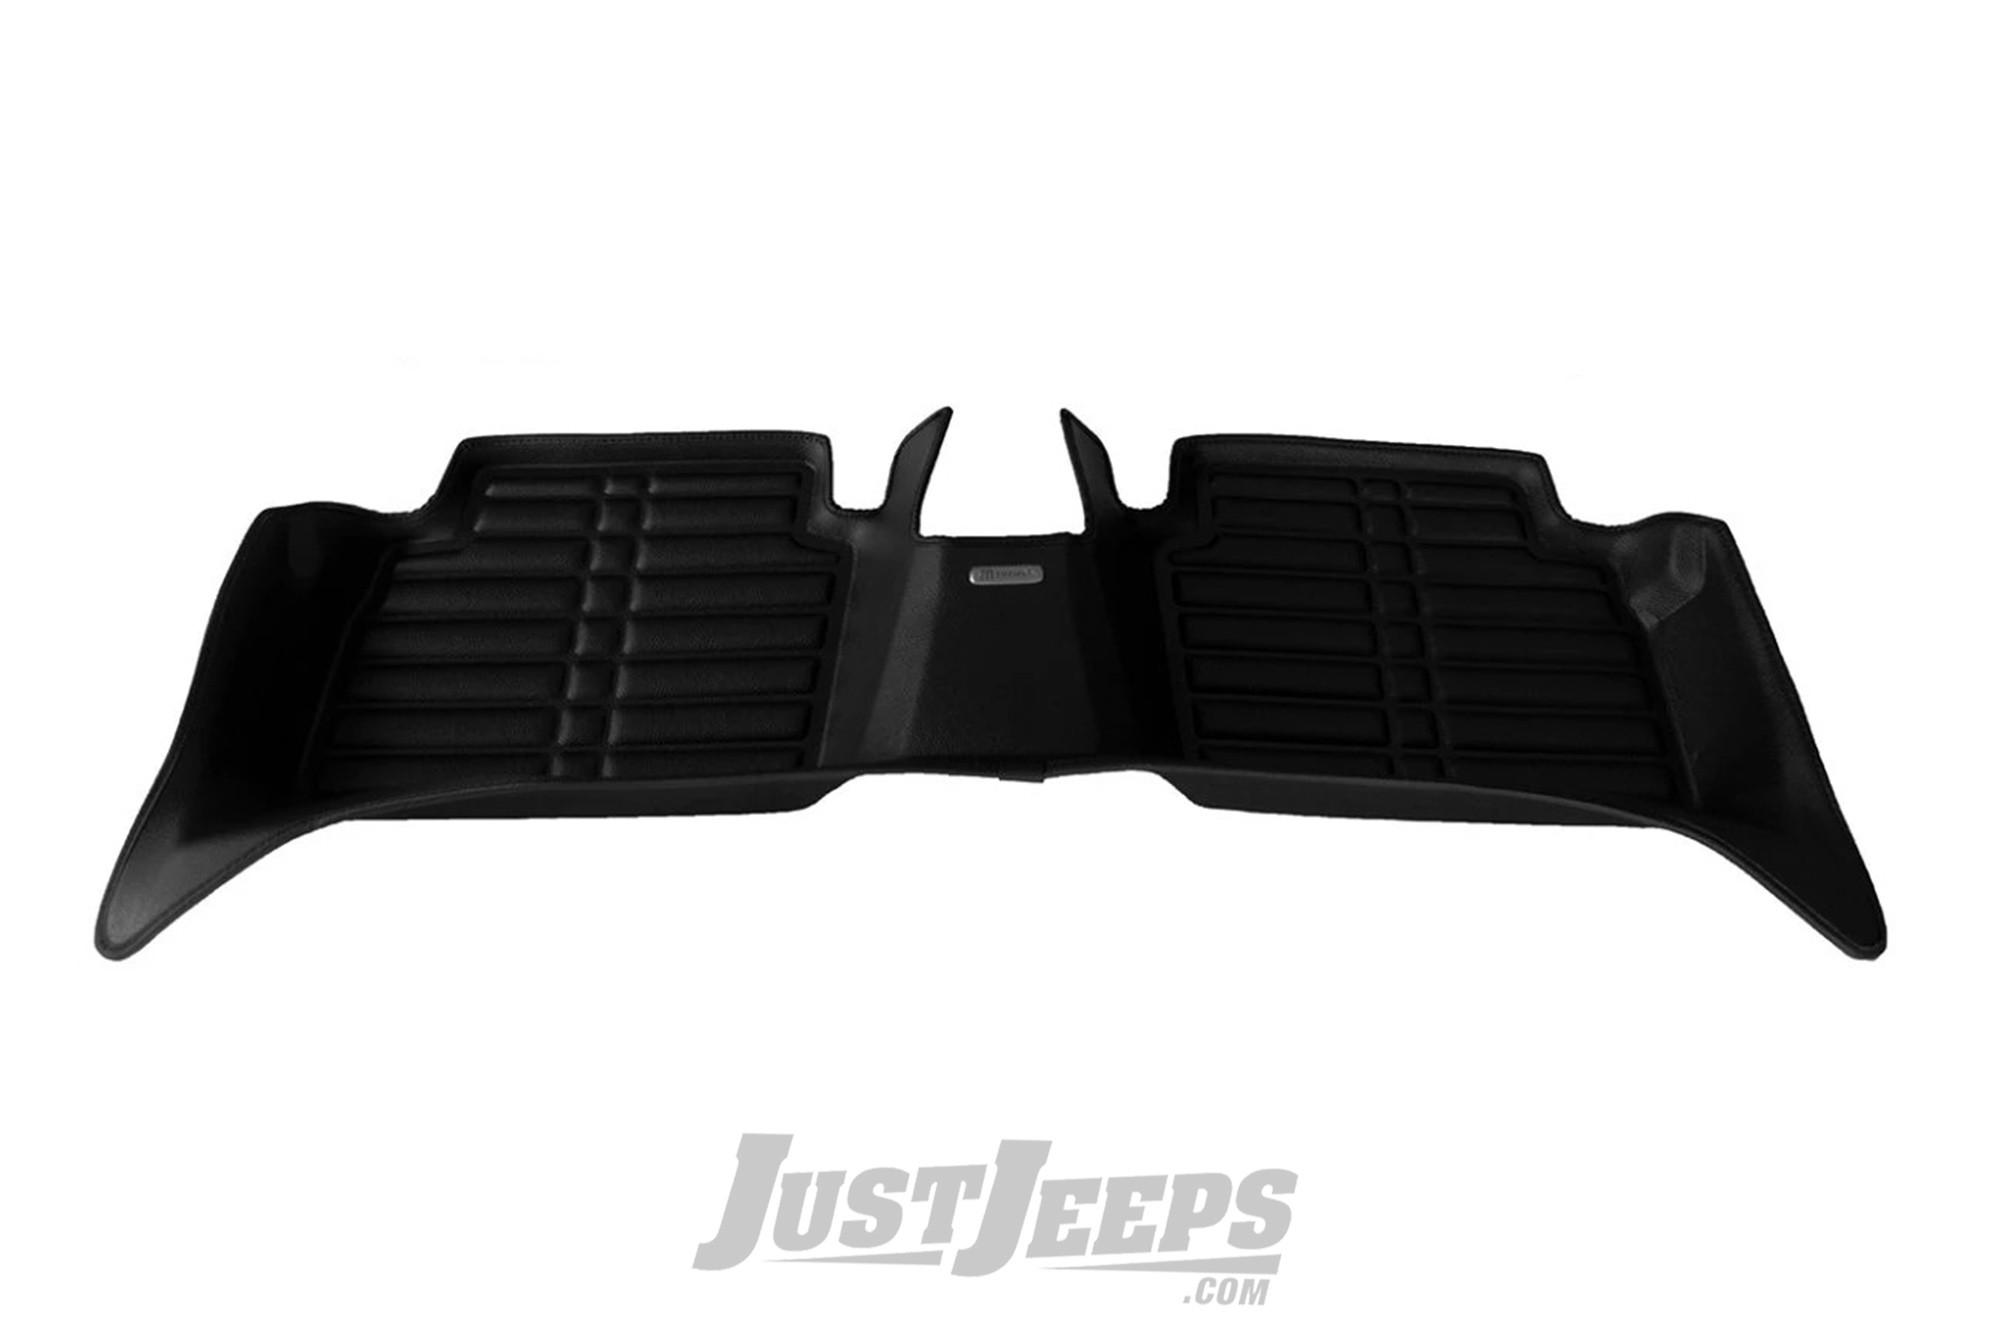 TuxMat Rear Floor Mat In Black For 2018+ Jeep Wrangler JL 2 Door Models 475-B